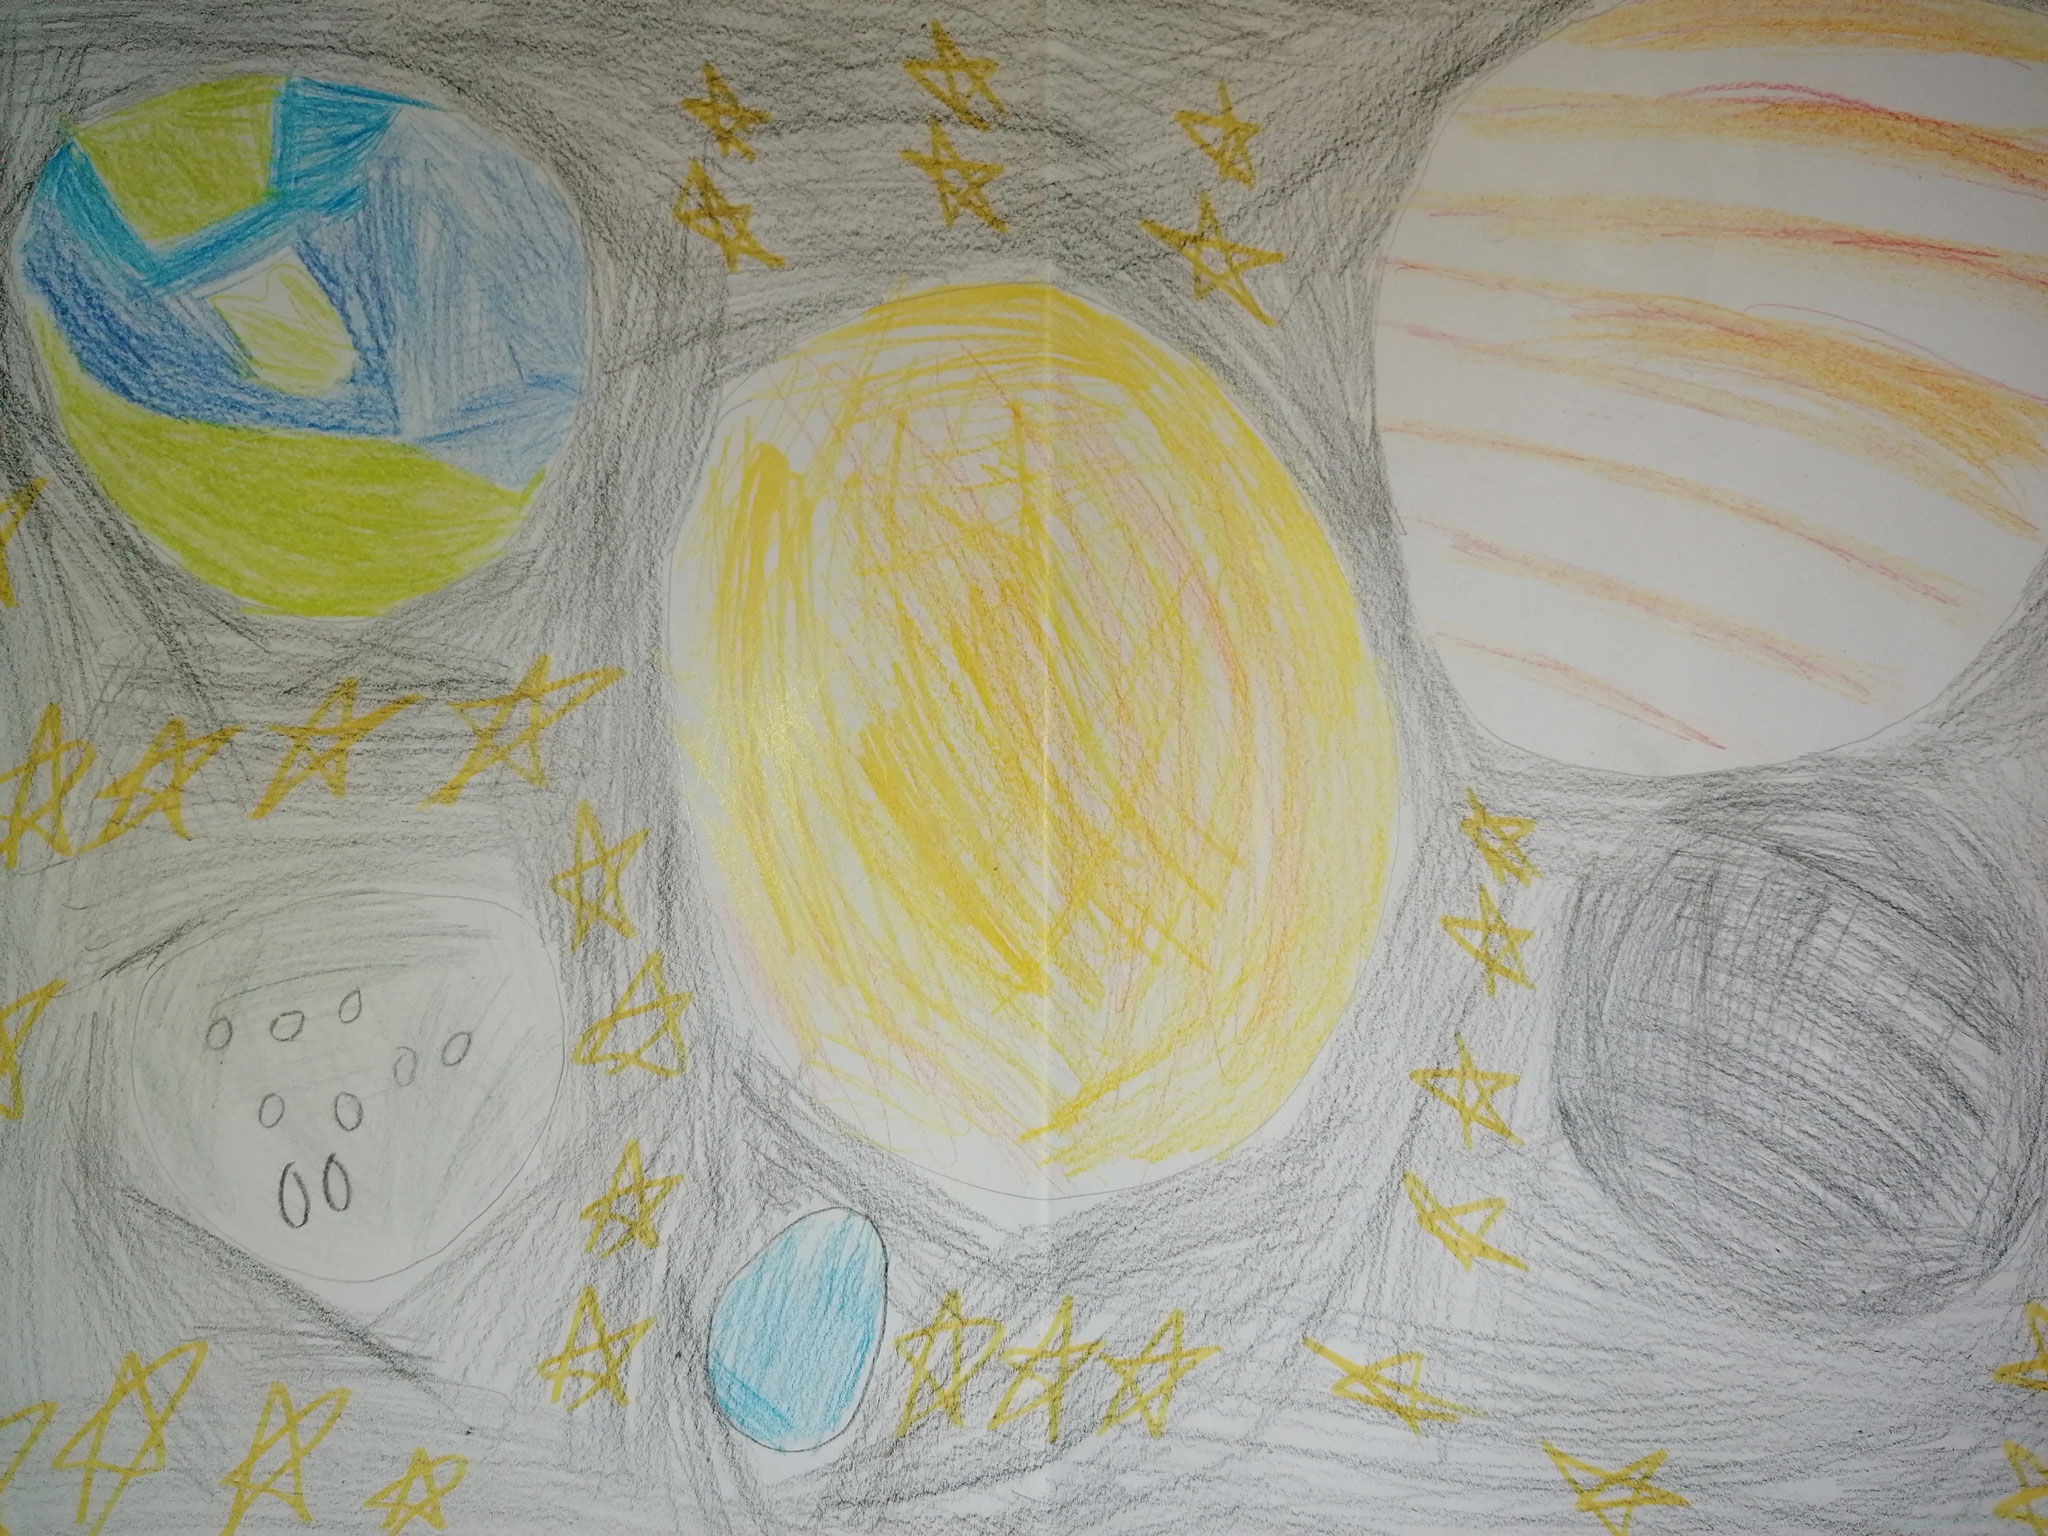 Hüseyin aus der 3a malt das Sonnensystem